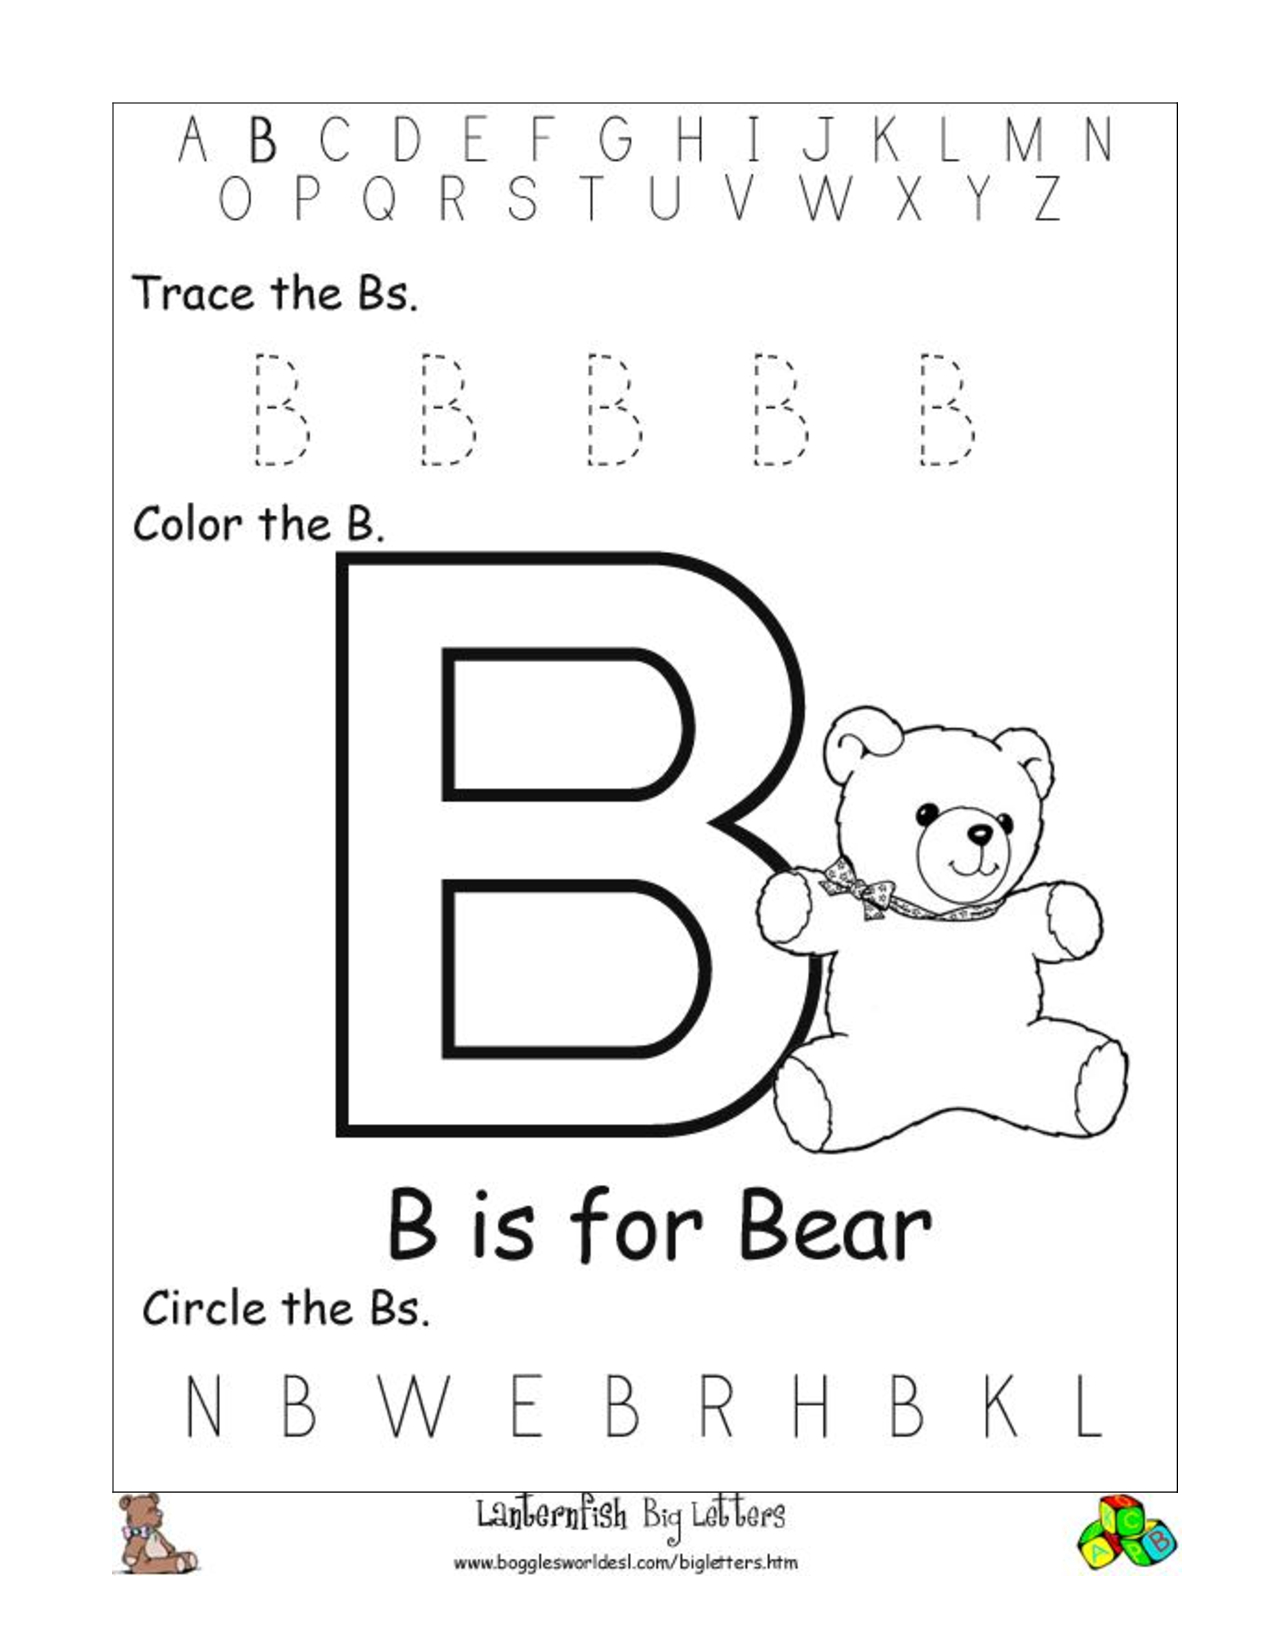 Alphabet Worksheet Big Letter B Doc | Preschool- Alphabet intended for Alphabet Worksheets Doc